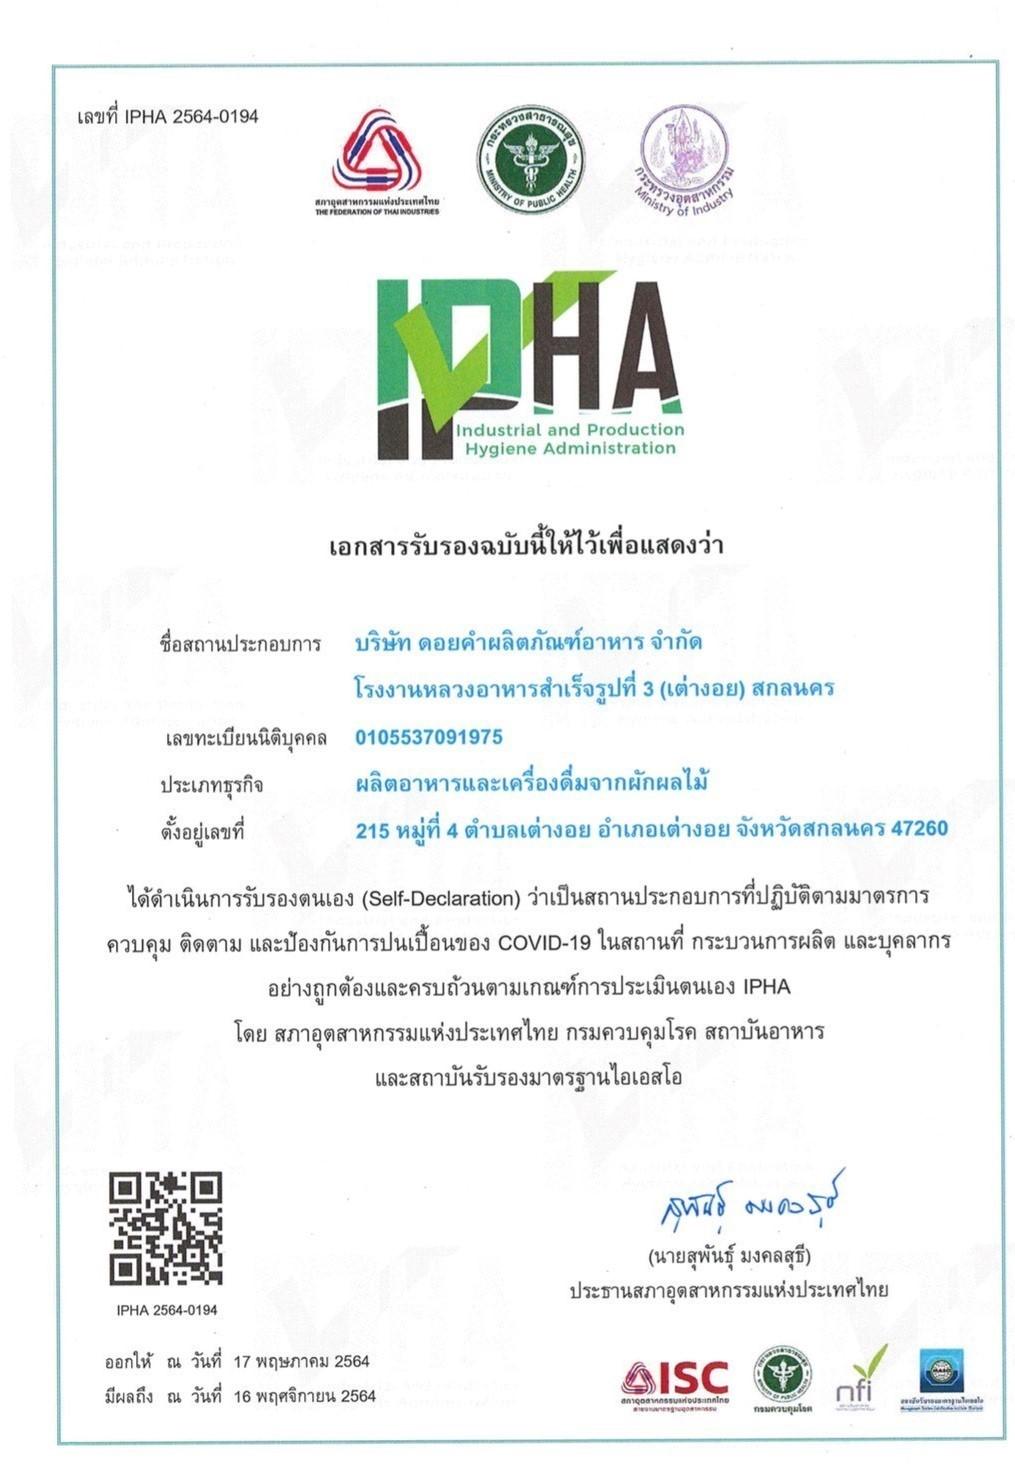 IPHA DK3